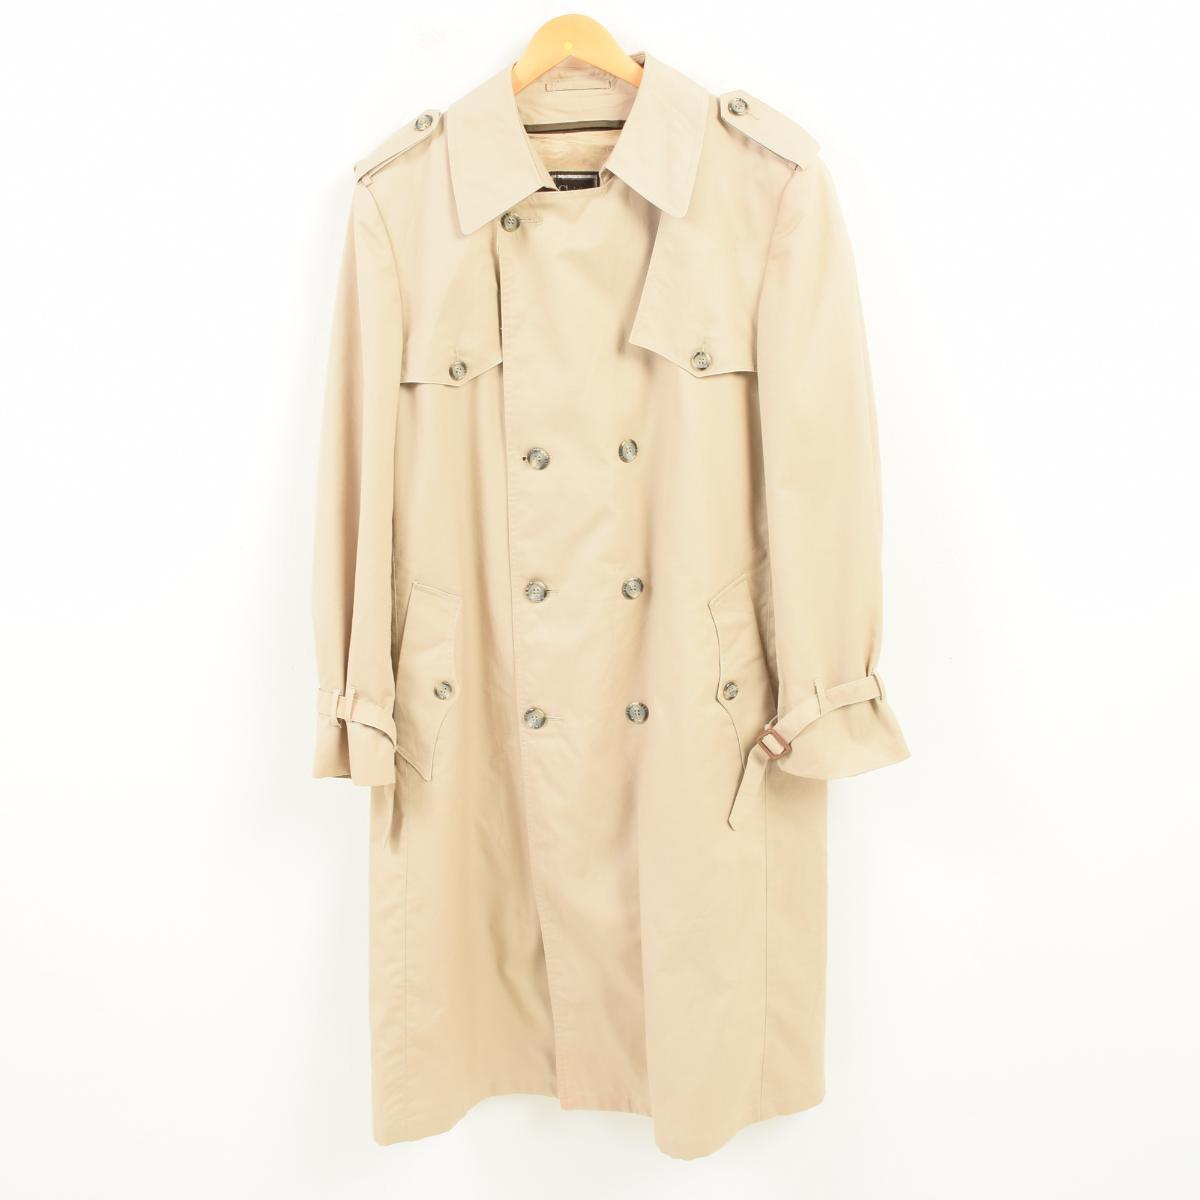 new products 35d97 0b14d クリスチャンディオール Christian Dior MONSIEUR ライナー付き トレンチコート メンズL /wan7680 【180304】